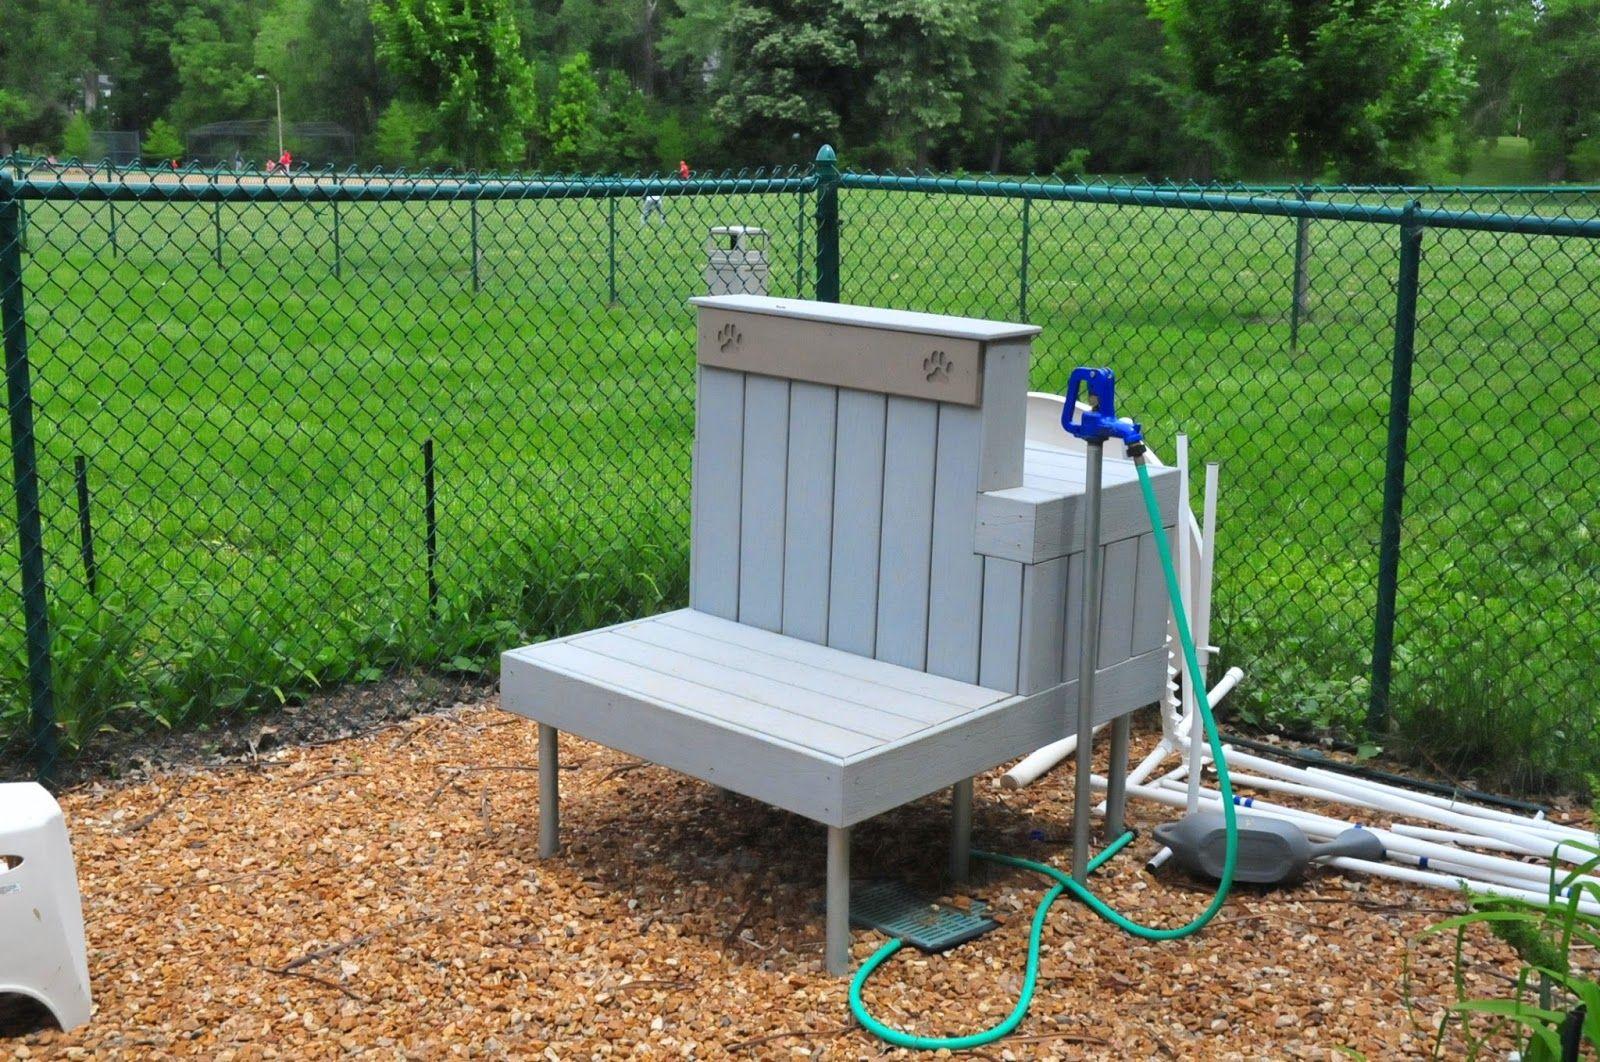 Dog Wash Jpg 1600 1062 Dog Washing Station Dog Wash Outdoor Dog